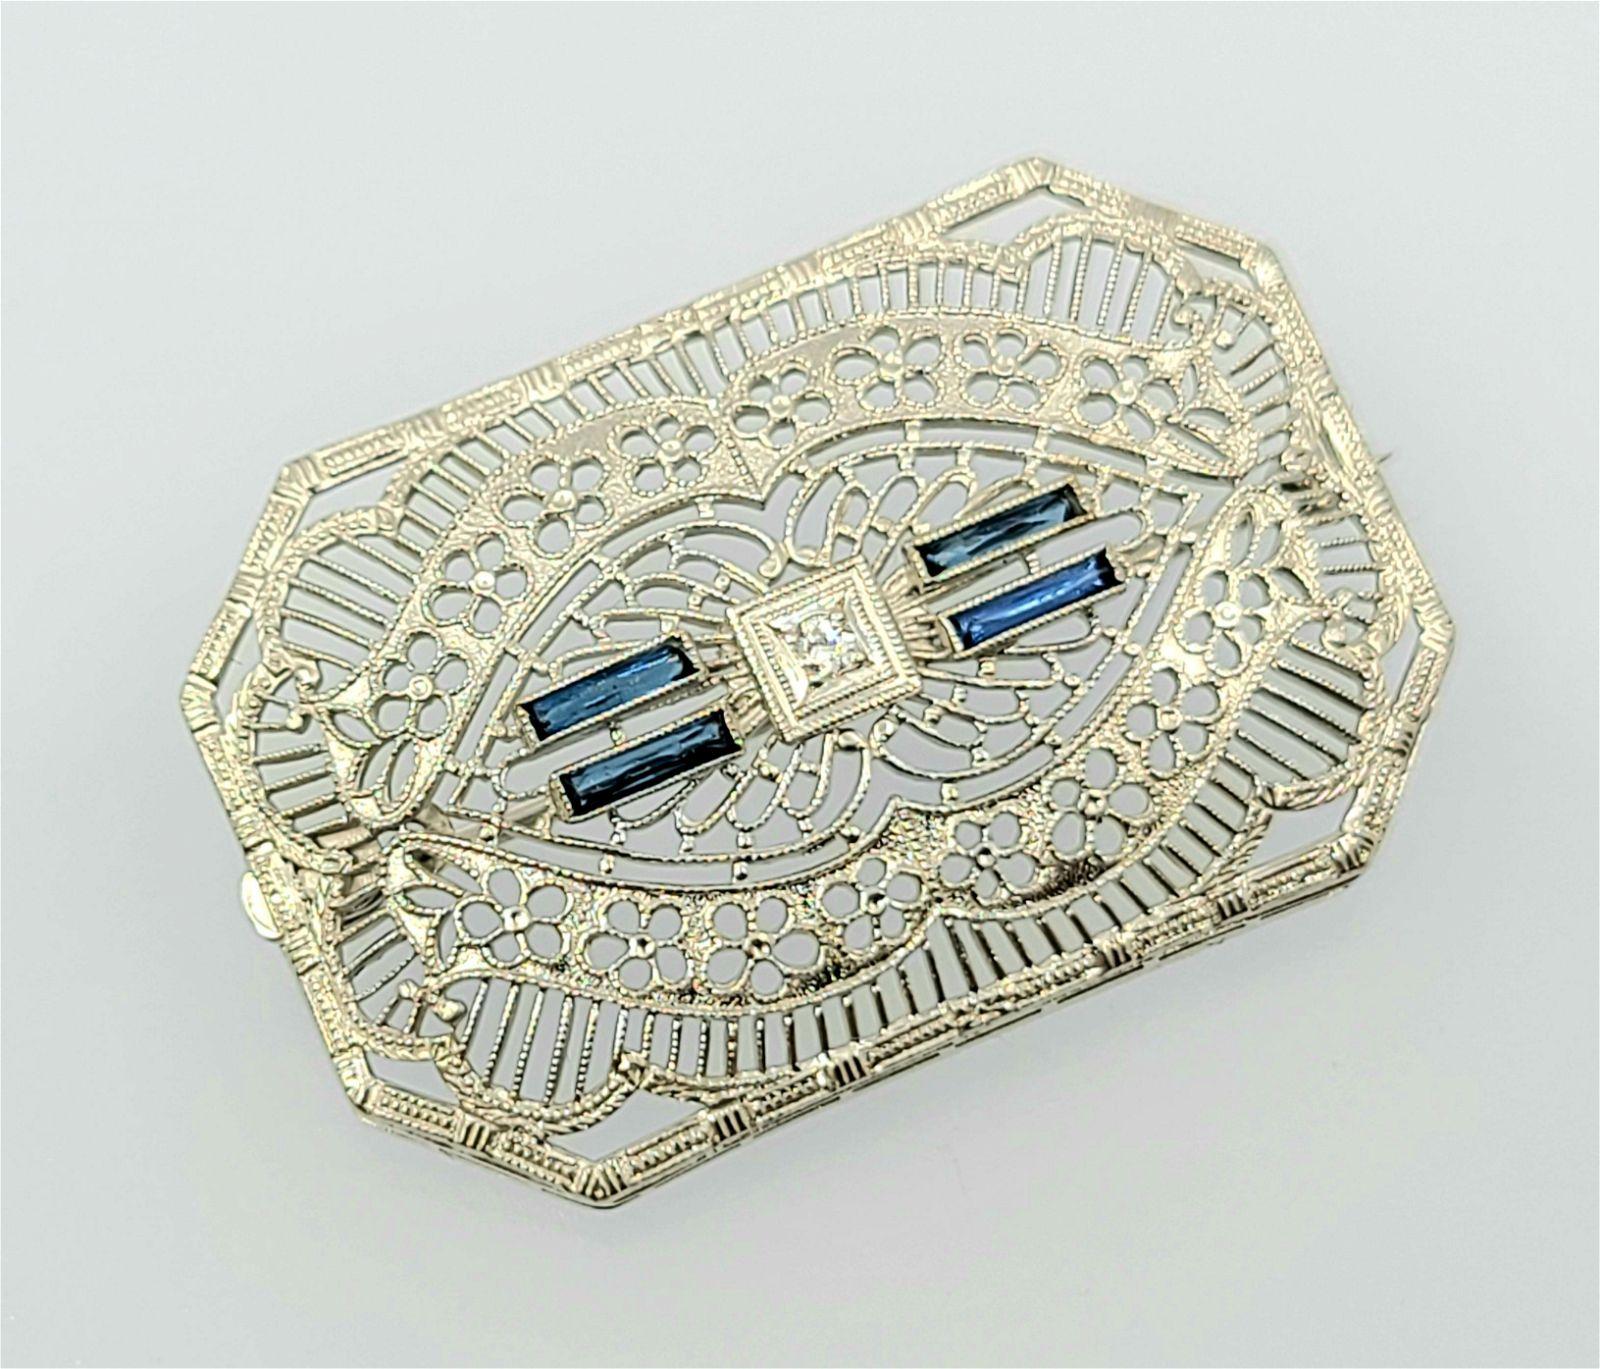 Antique 10k Filigree sapphire brooch pin